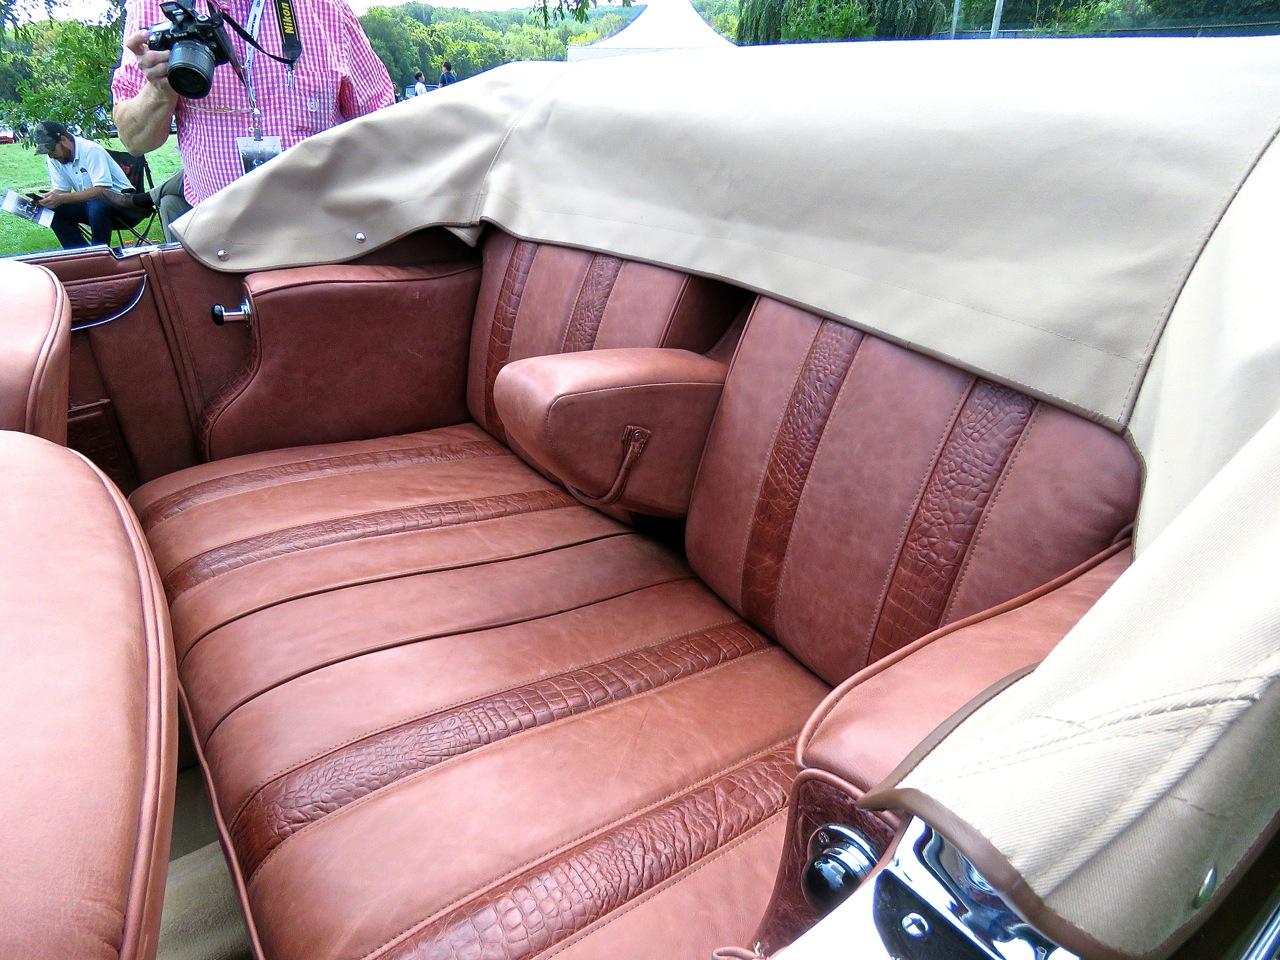 Delage D8S Cabriolet 15